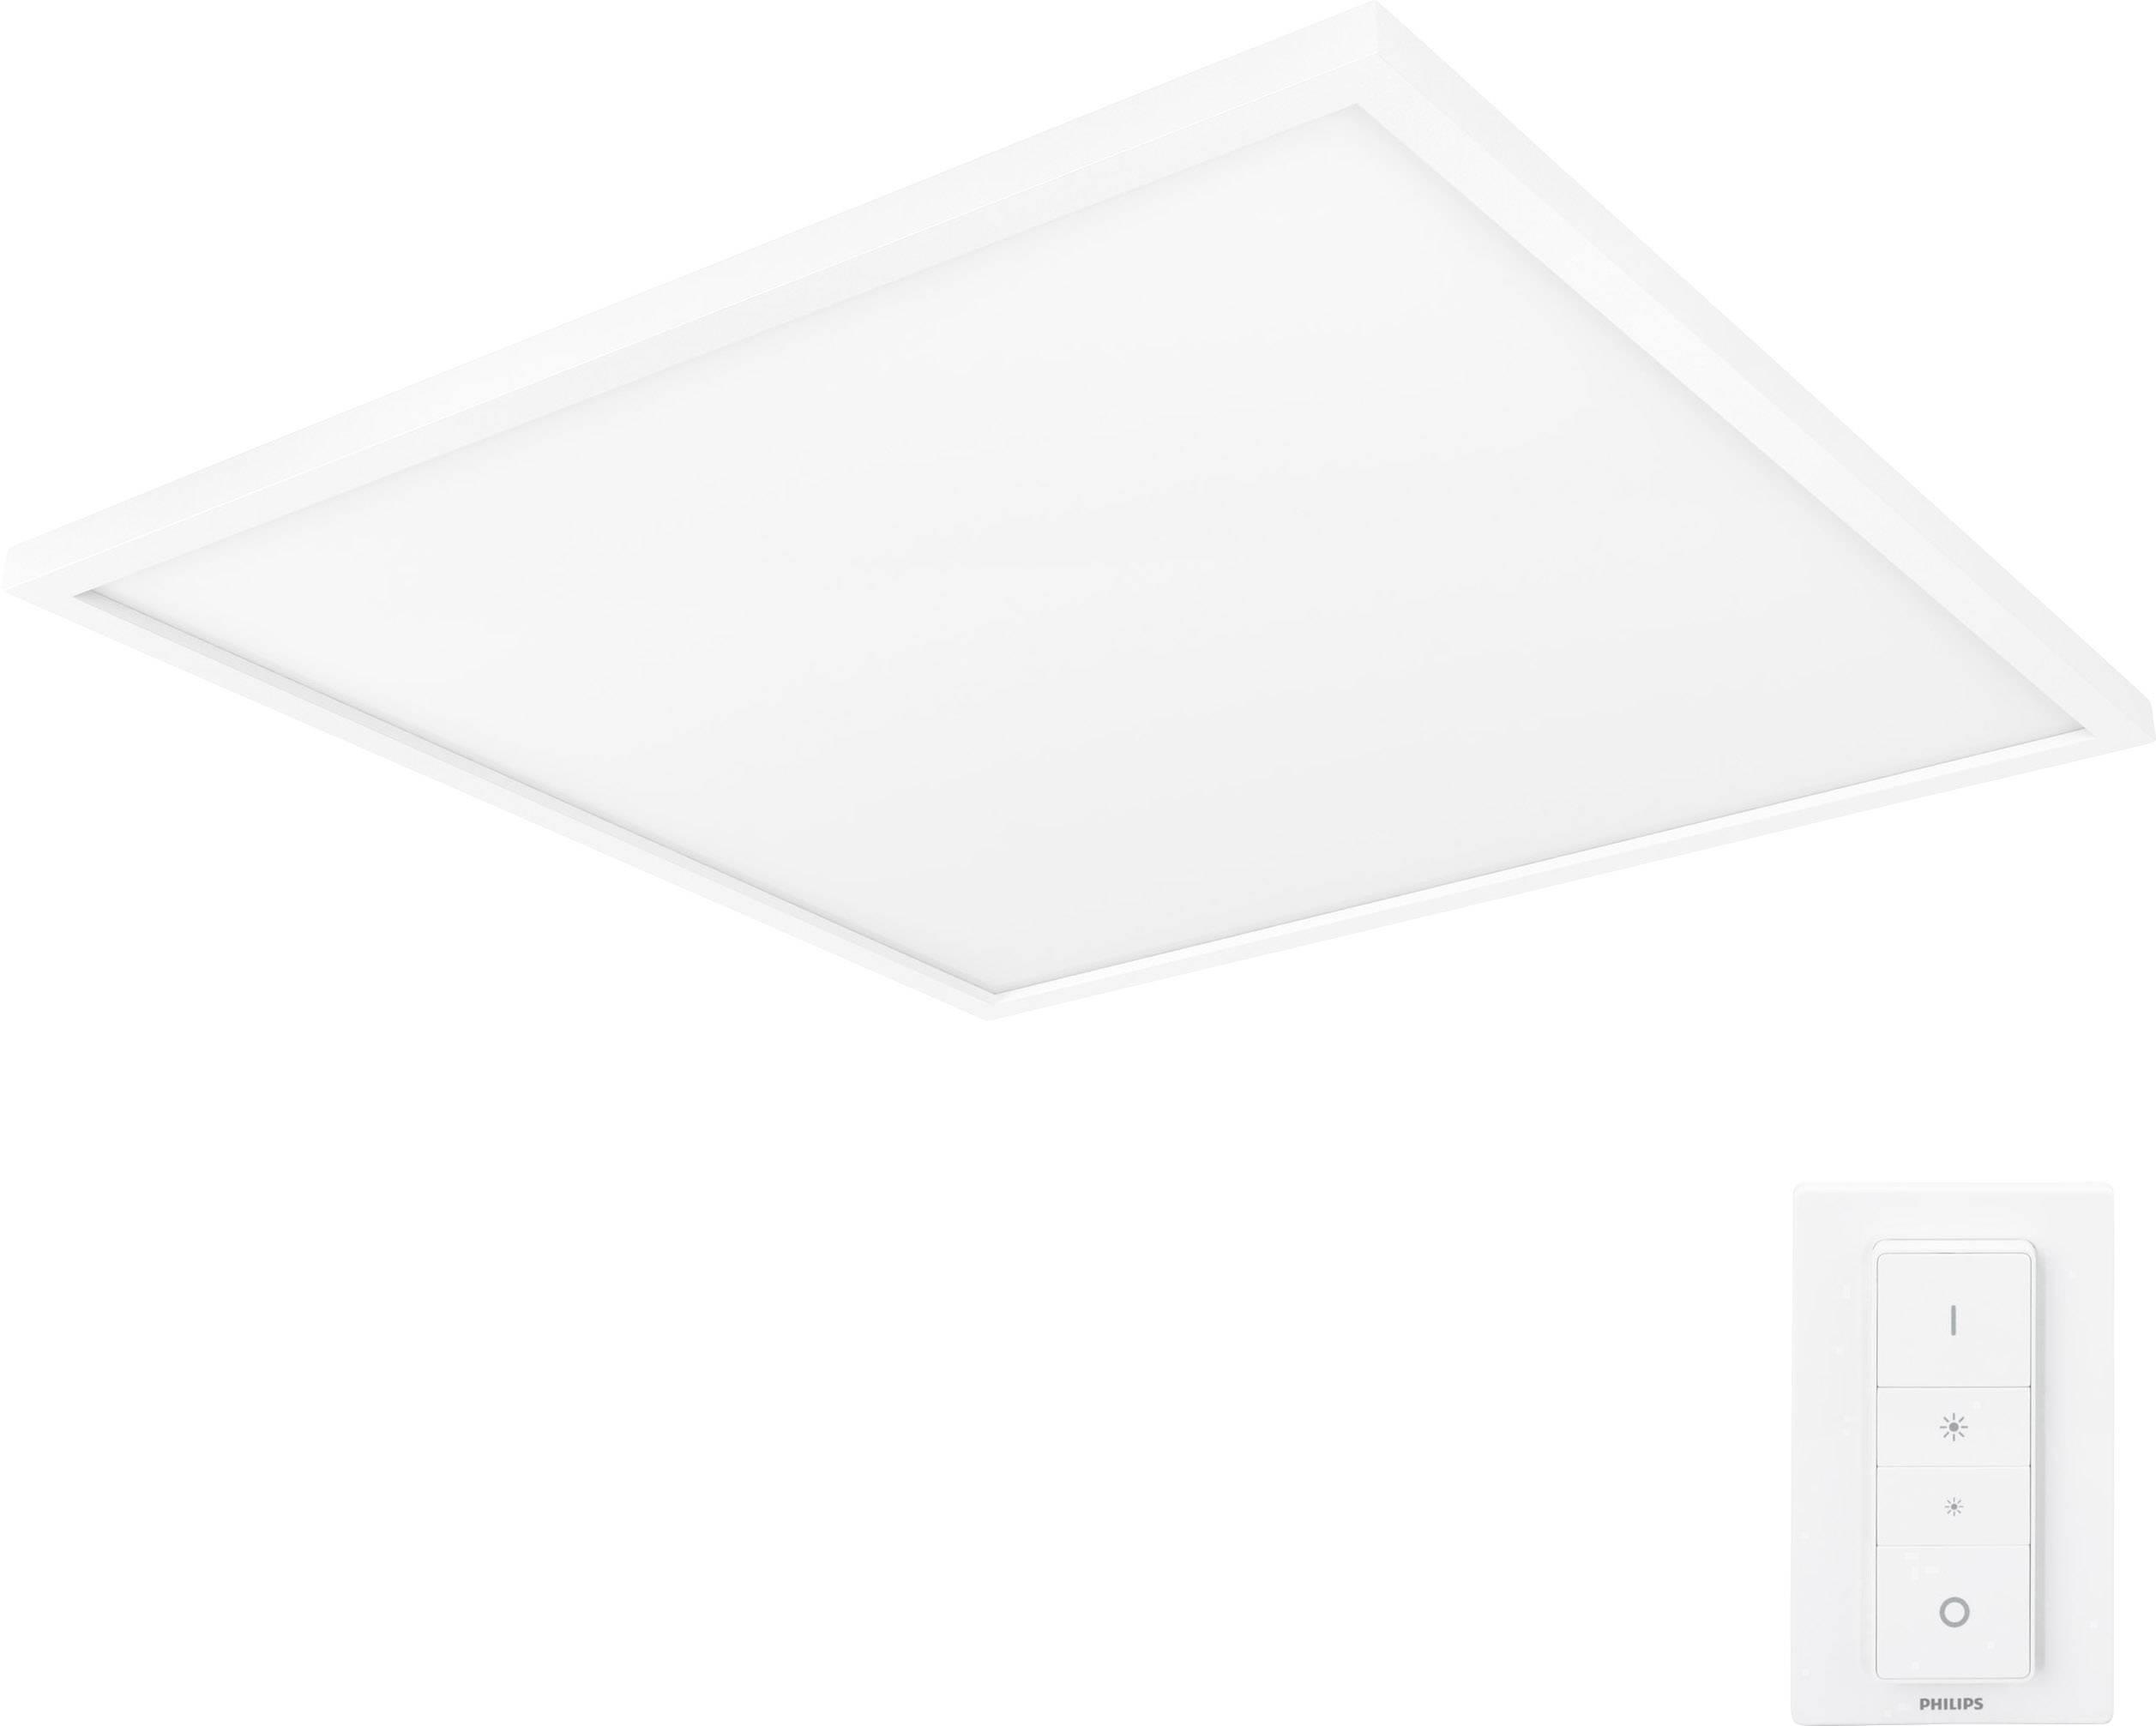 huge discount 0c94a 11221 Philips Lighting Hue LED lighting panel (+ dimmer) Aurelle EEC: LED (A++ -  E) Built-in LED 55 W Warm white, Neutral whit